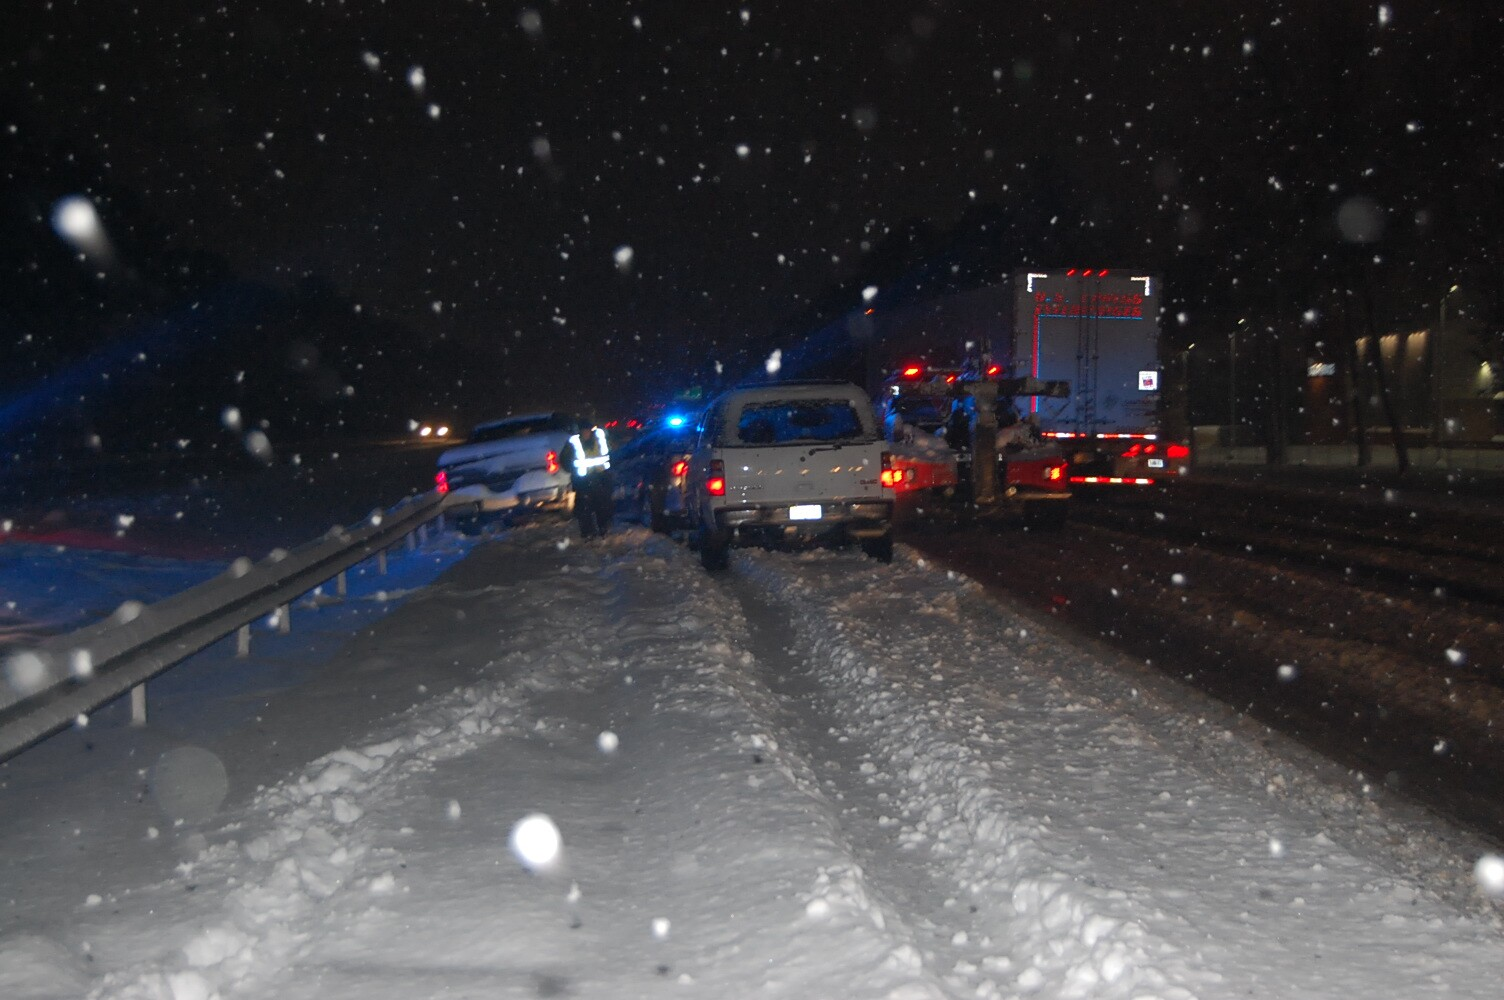 Photos: Trooper injured after driver rear-ends cruiser along I-95 inHanover